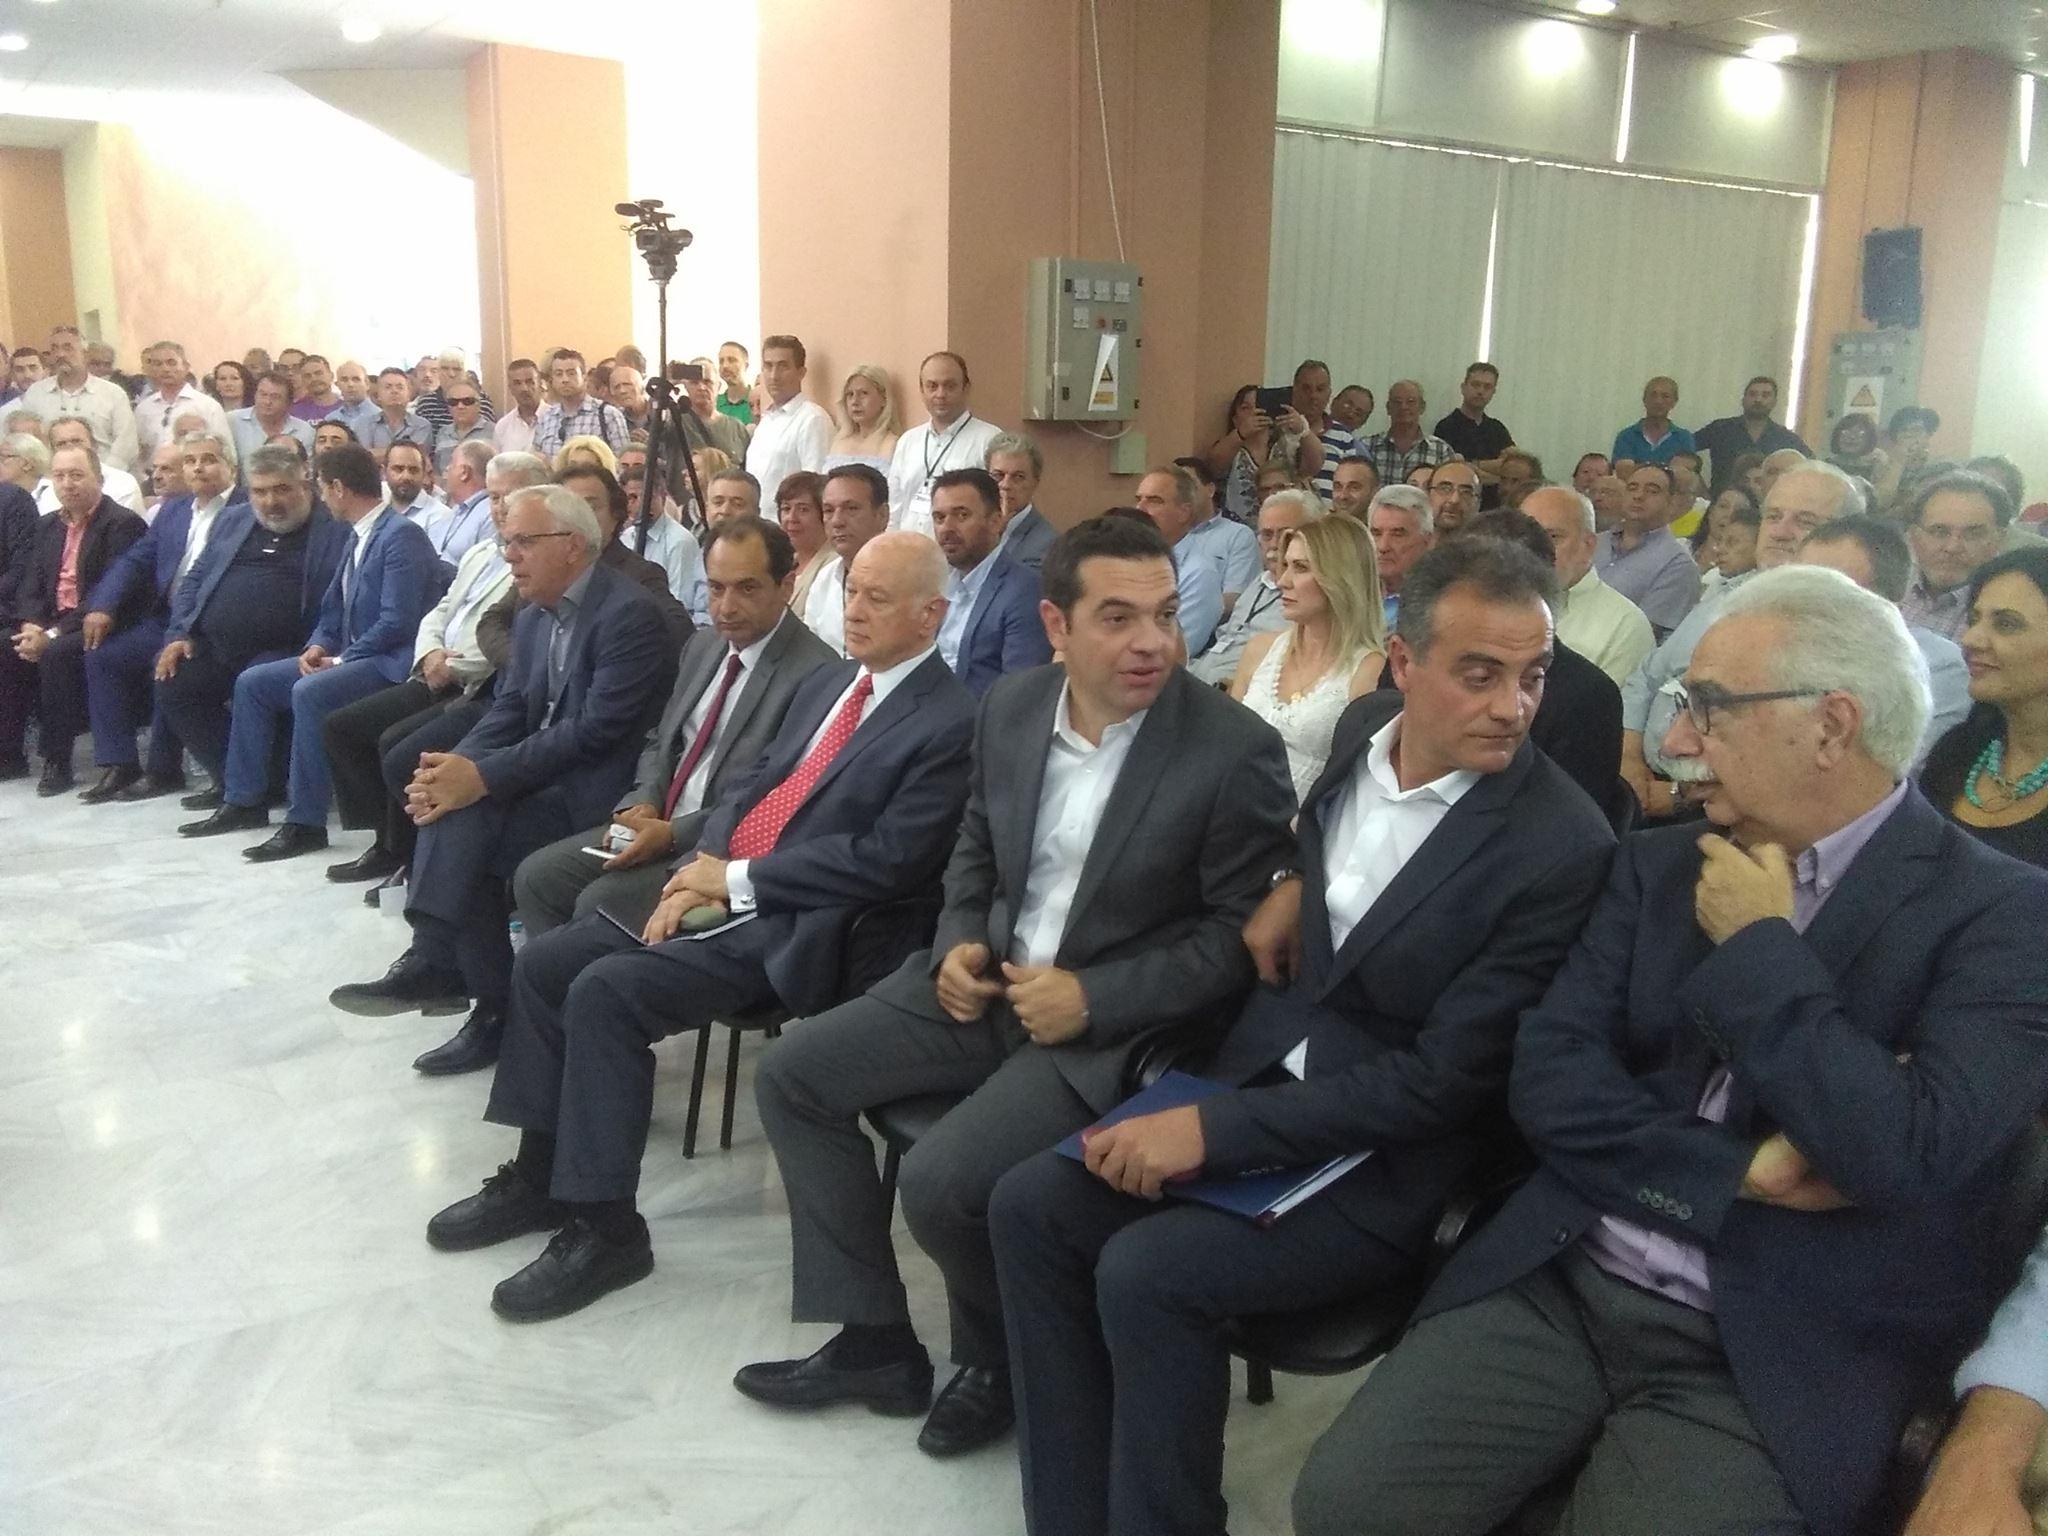 "kozan.gr: Kαρυπίδης από το βήμα του συνεδρίου στα Κοίλα Κοζάνης: ""Η παροχή φθηνότερης ηλεκτρικής ενέργειας πρέπει να αποτυπωθεί σήμερα. Το αίτημα αυτό δεν είναι αίτημα απλά, είναι απαίτηση¨ (Φωτογραφίες)"